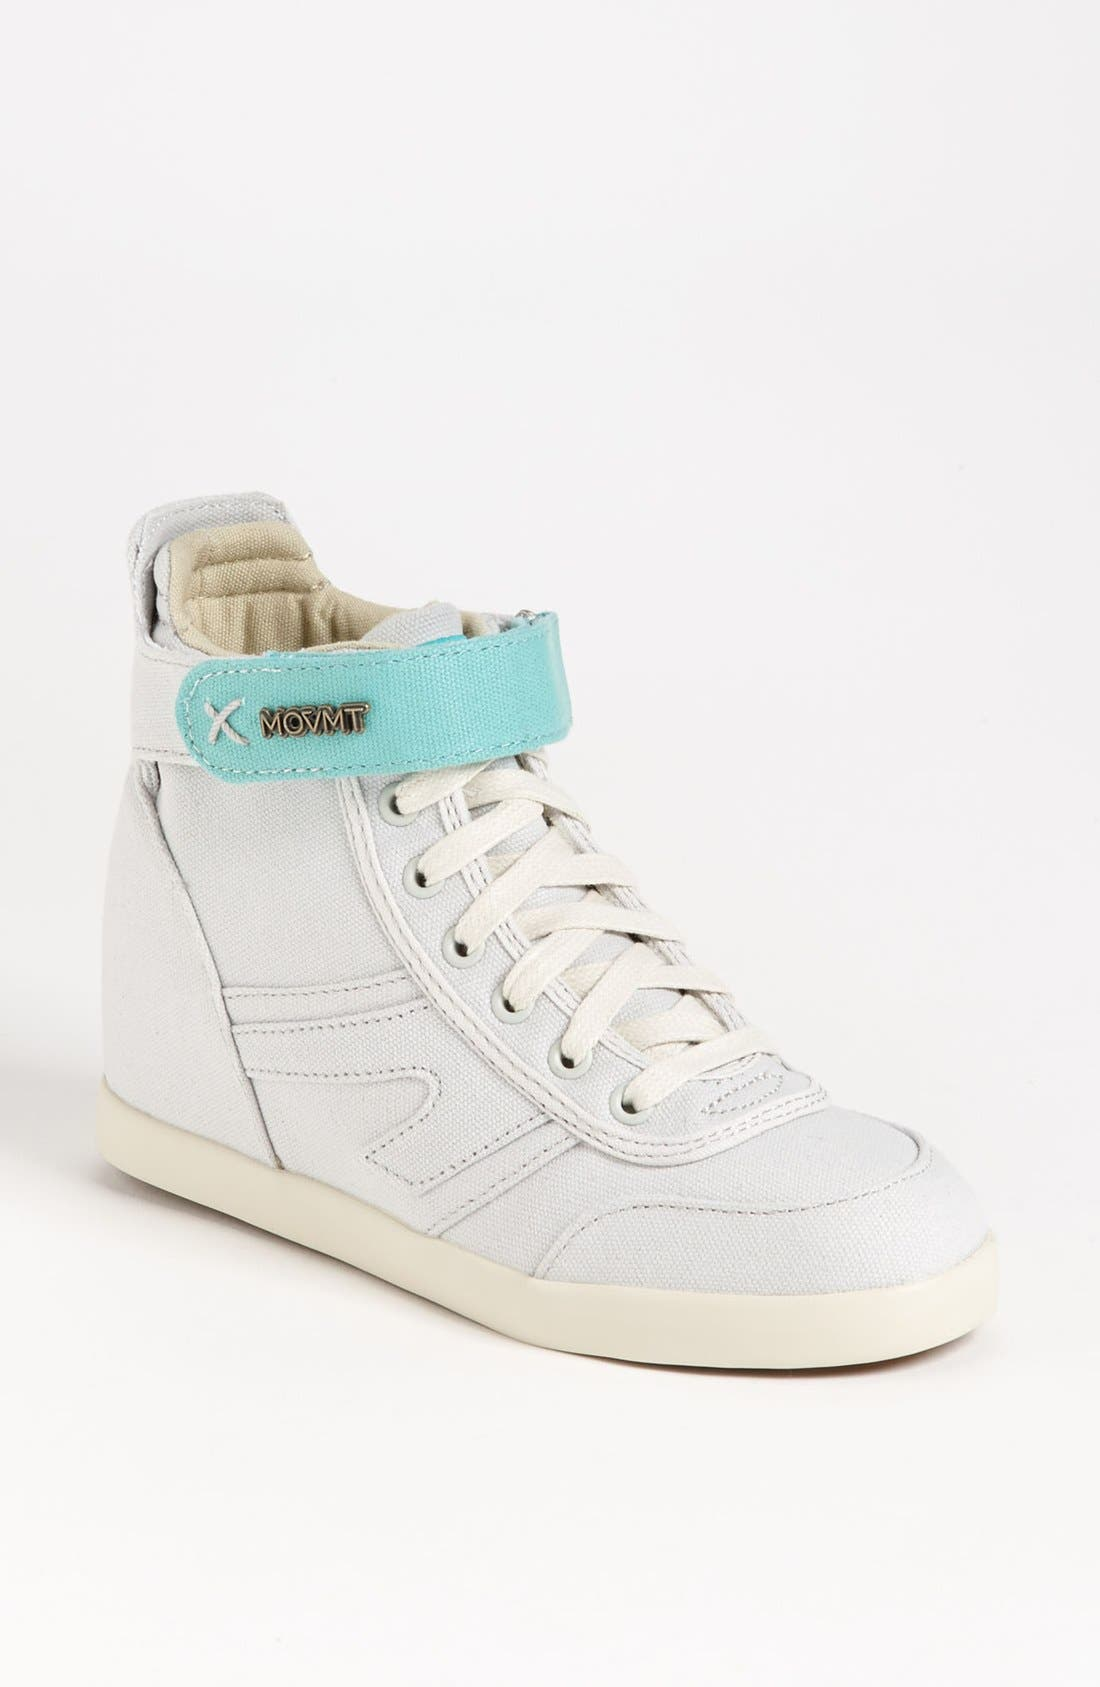 Main Image - The People's Movement 'Jade' Wedge Sneaker